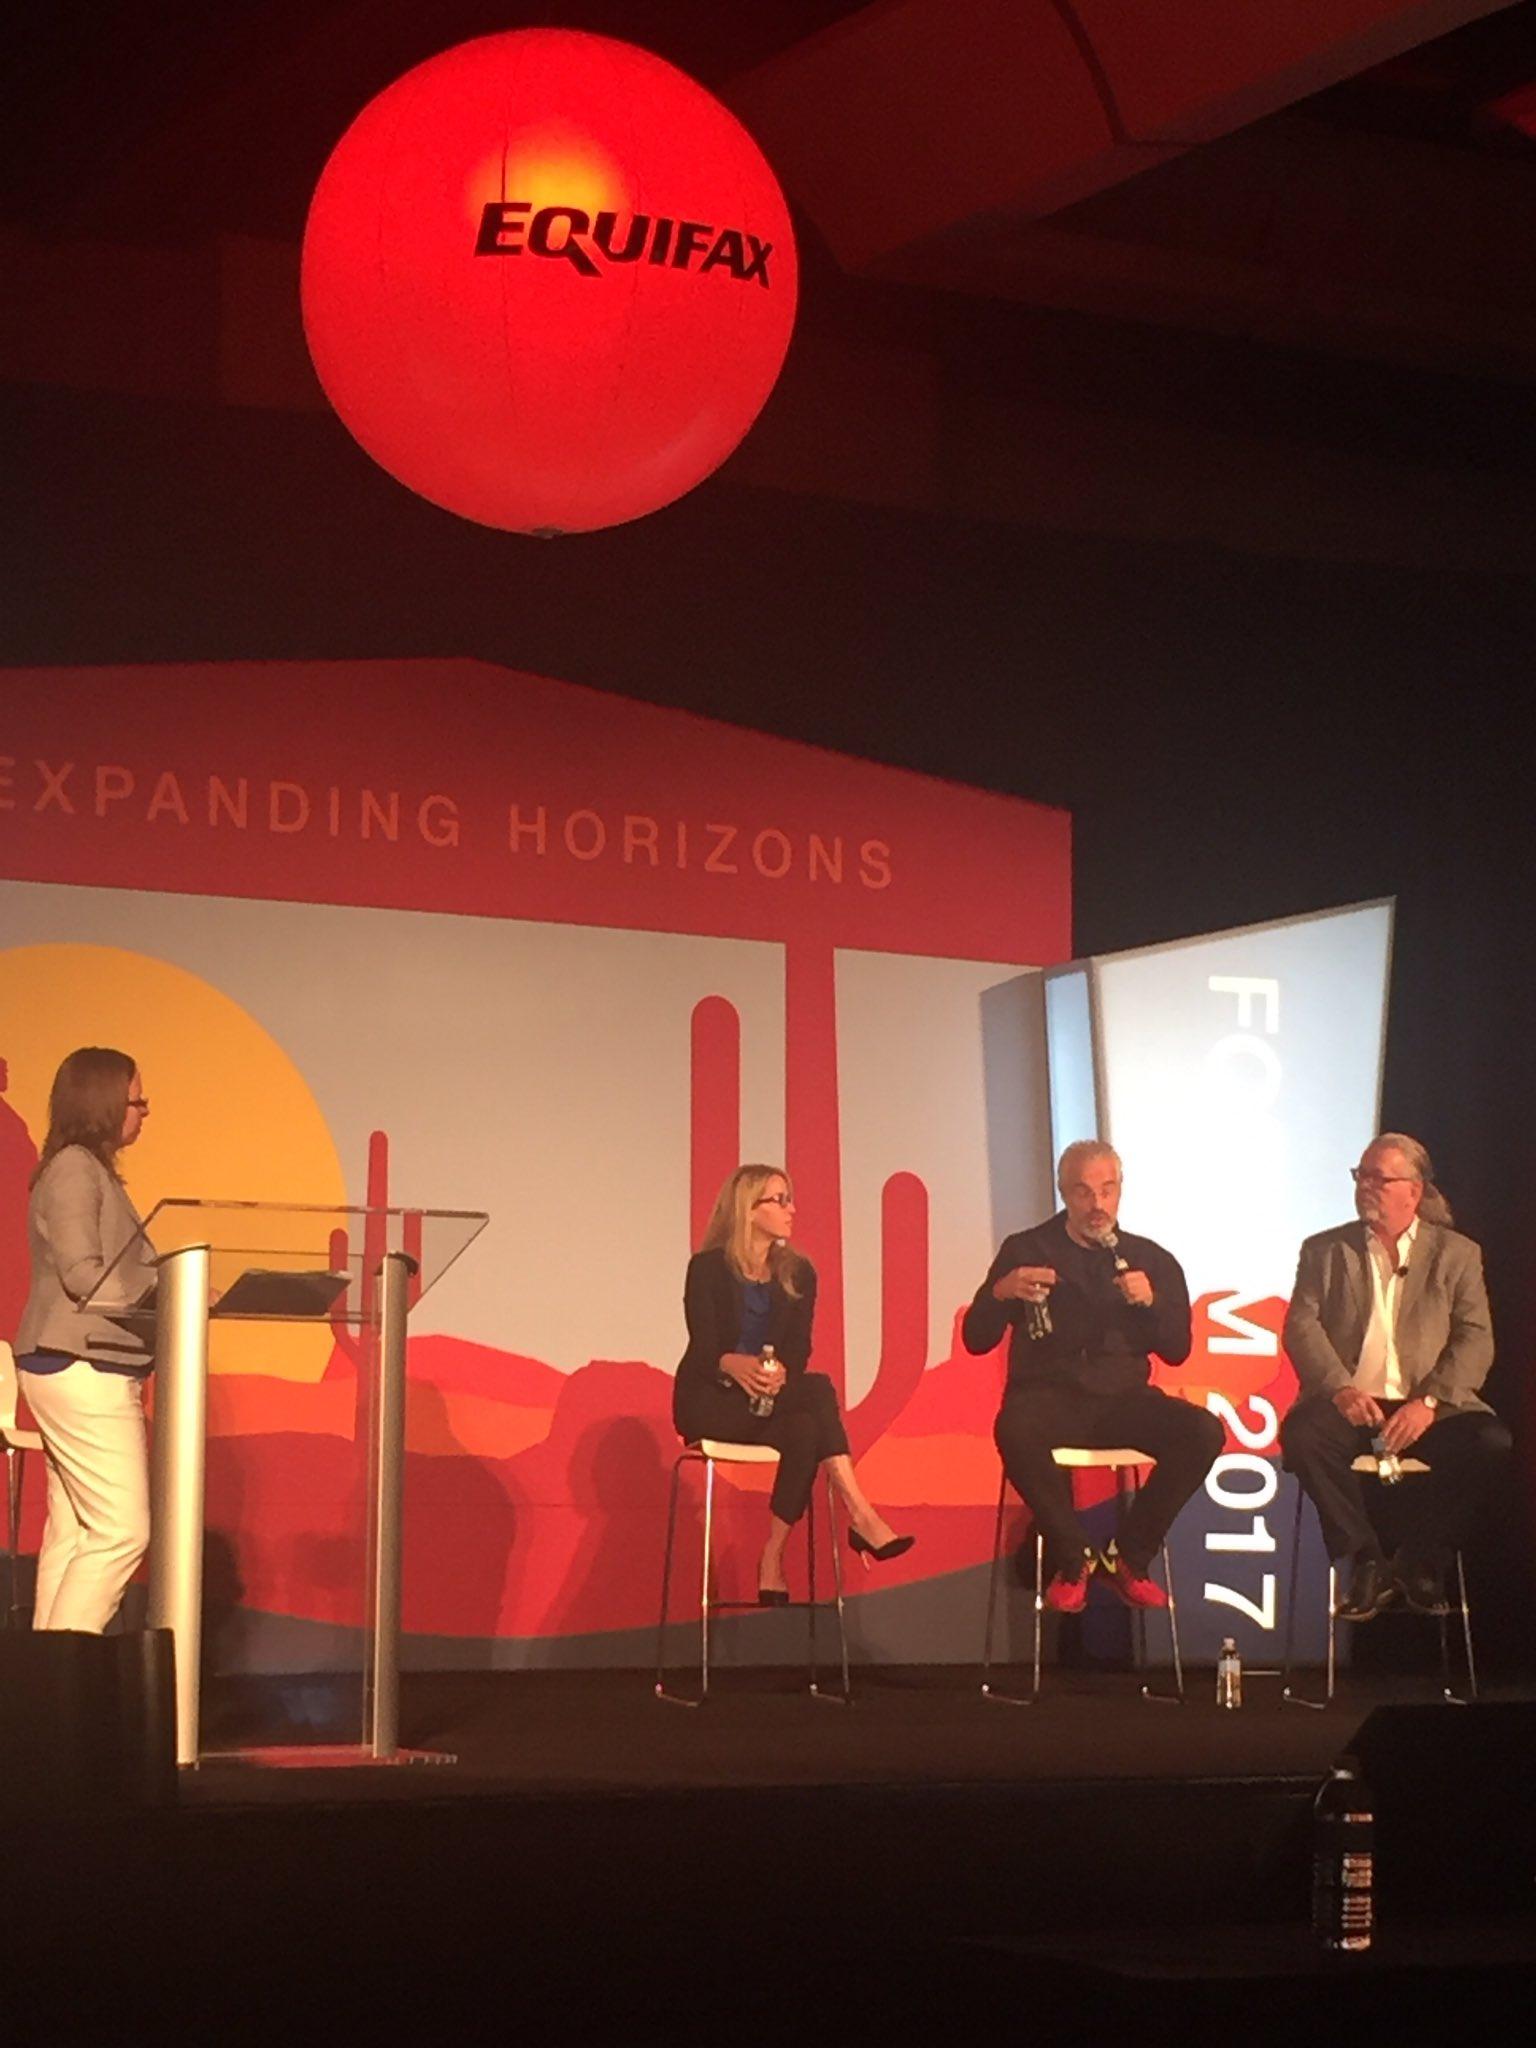 HR Trends - Dynamic trio @JohnSumser @Madtarquin @holgermu kick off Day 2 #efxforum17 w/ humor, savvy & insight! https://t.co/Alu0AArlBE